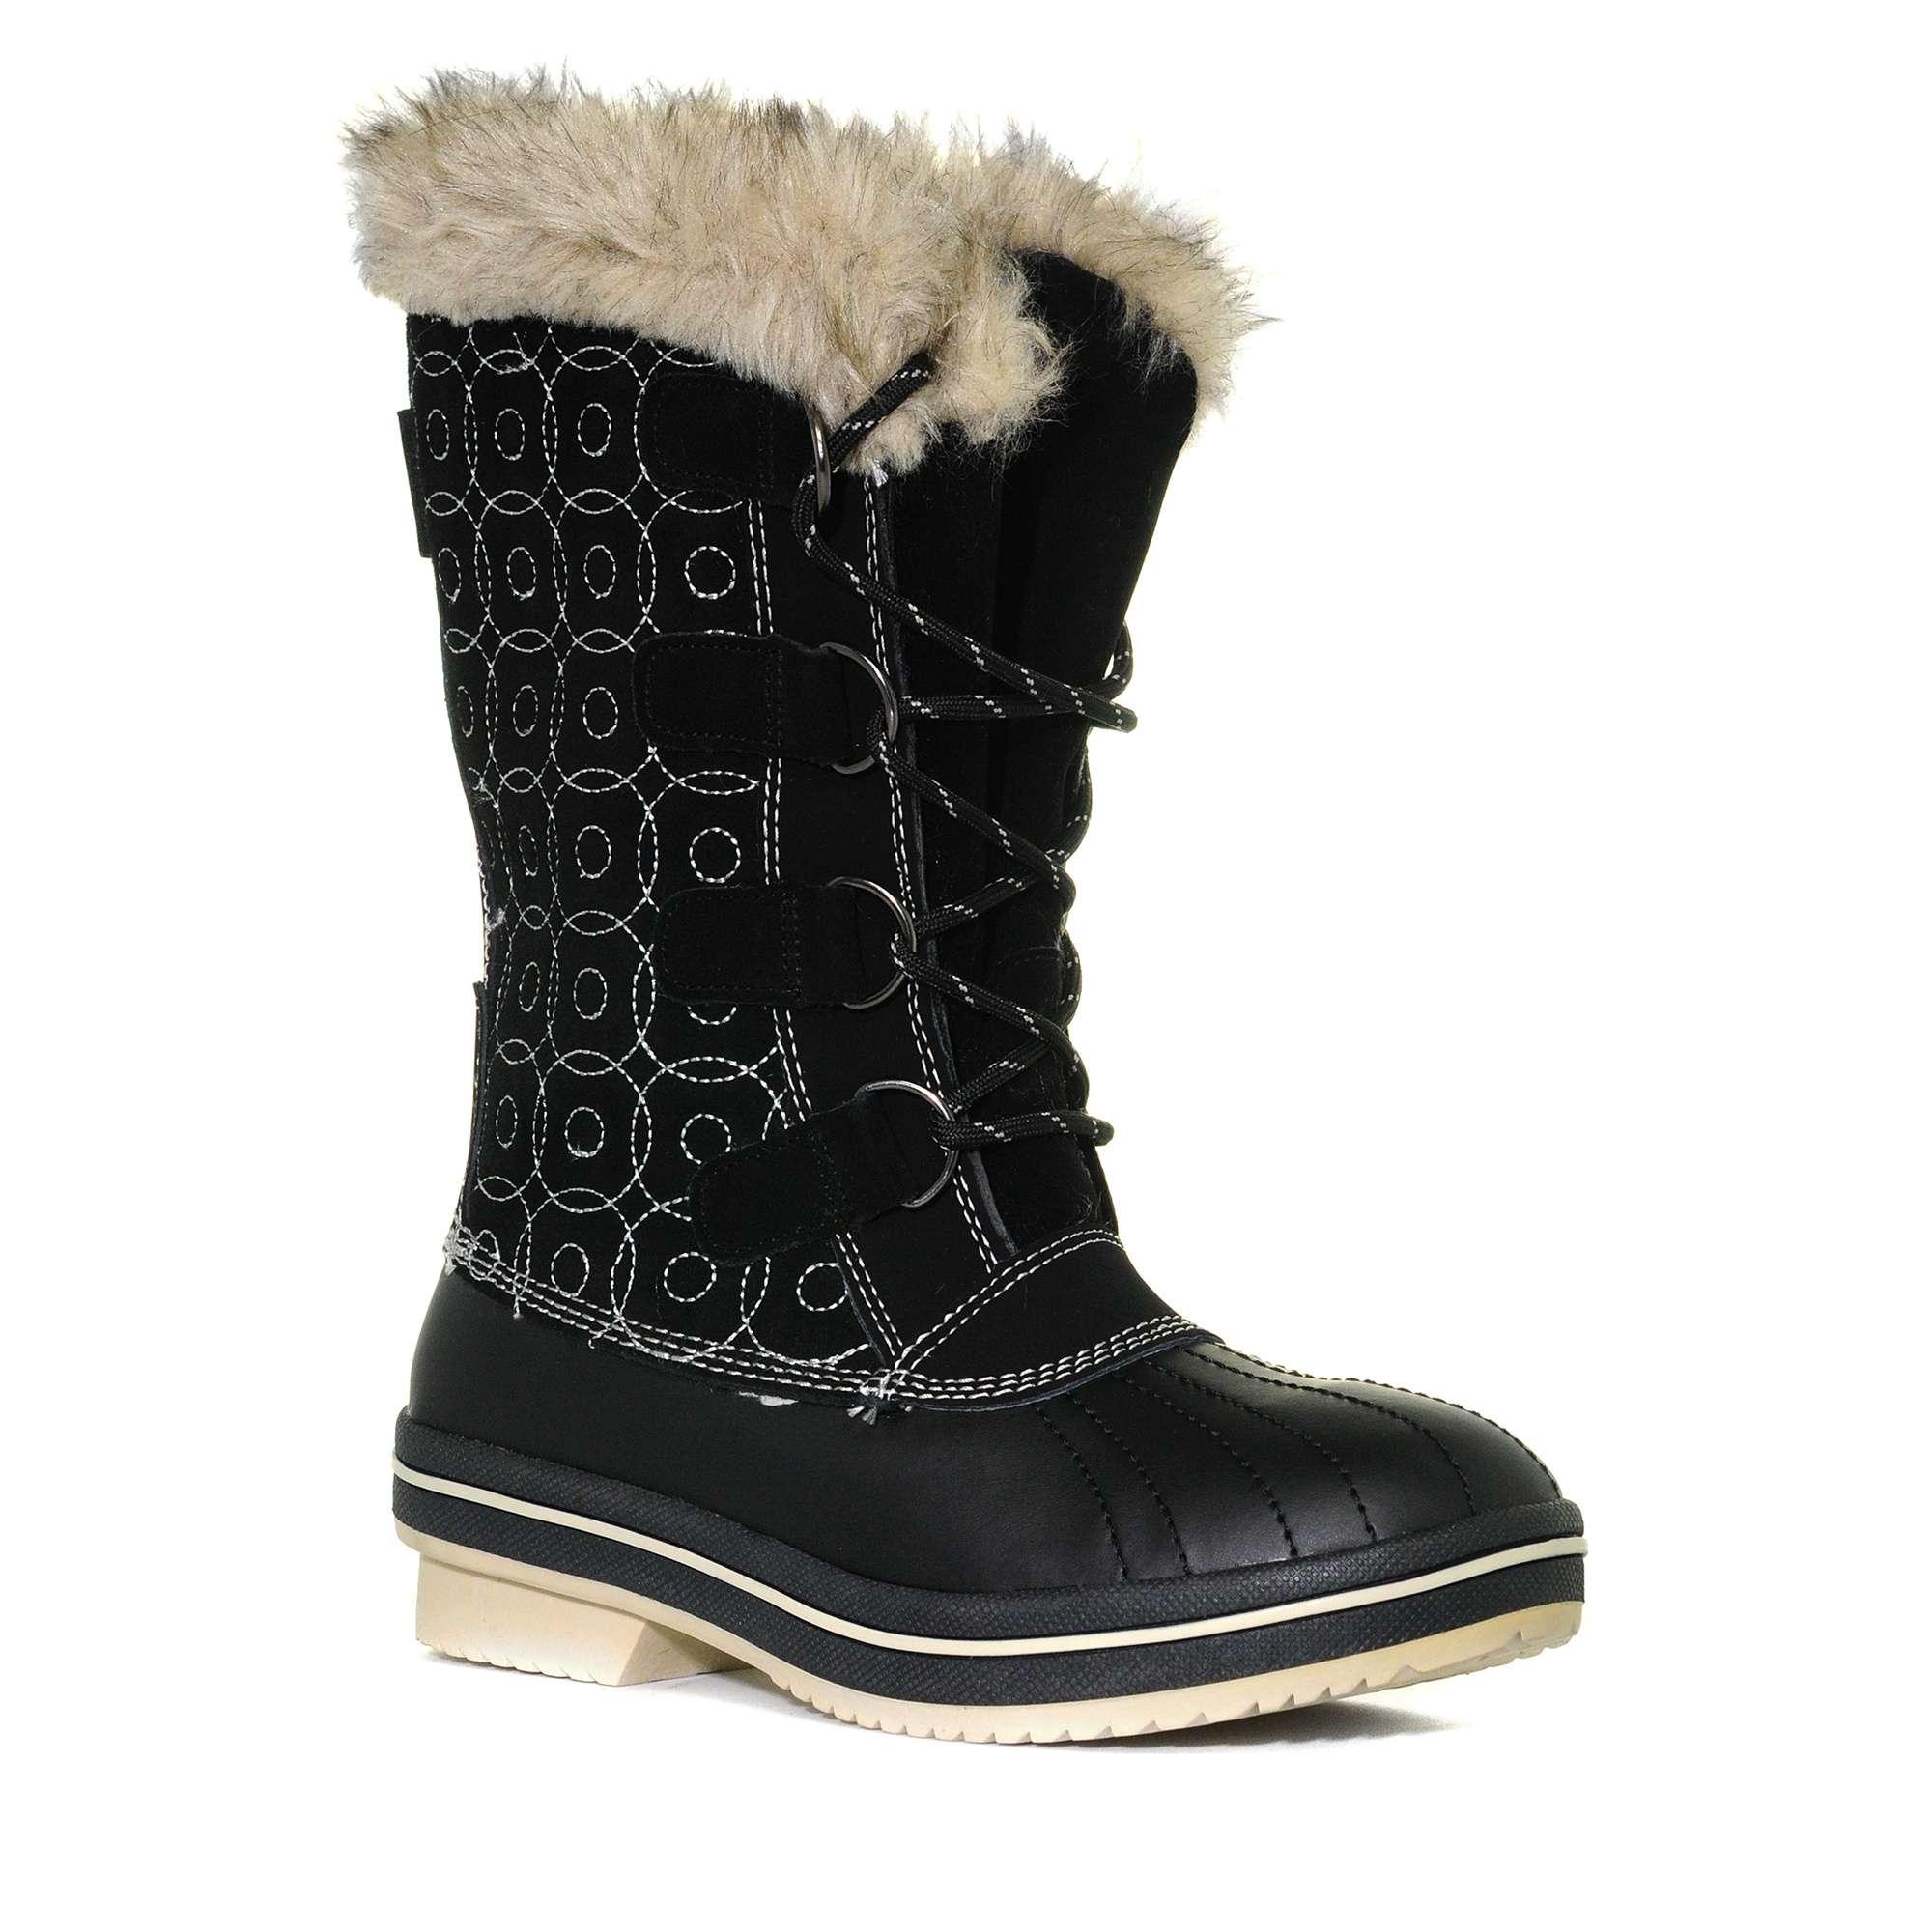 KARRIMOR Women's Flurry Snow Boots